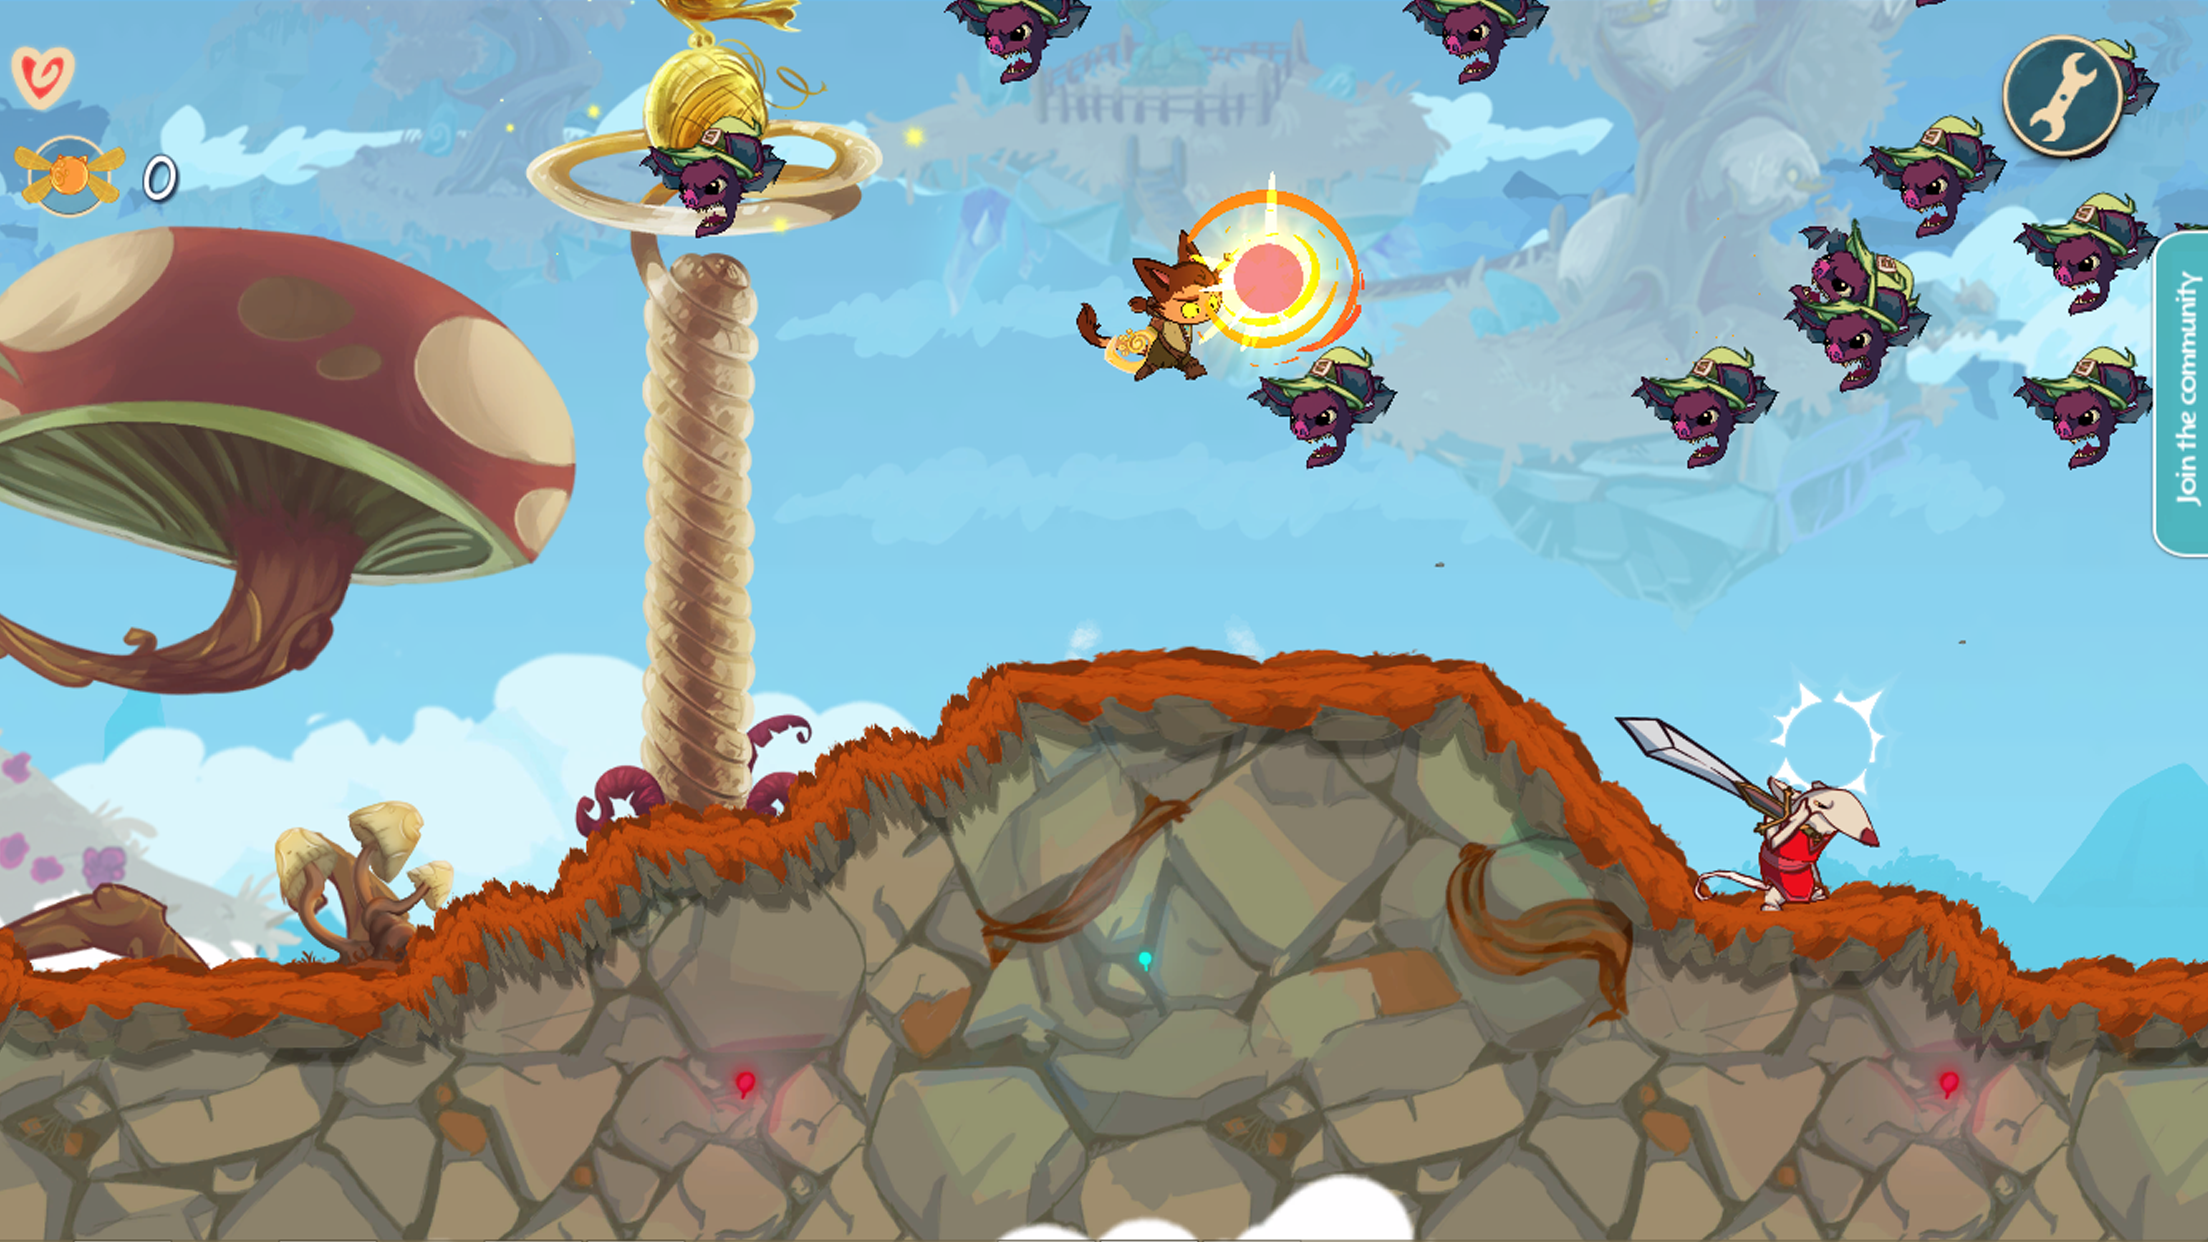 Crazy Dreamz MagiCats Edition now on iOS